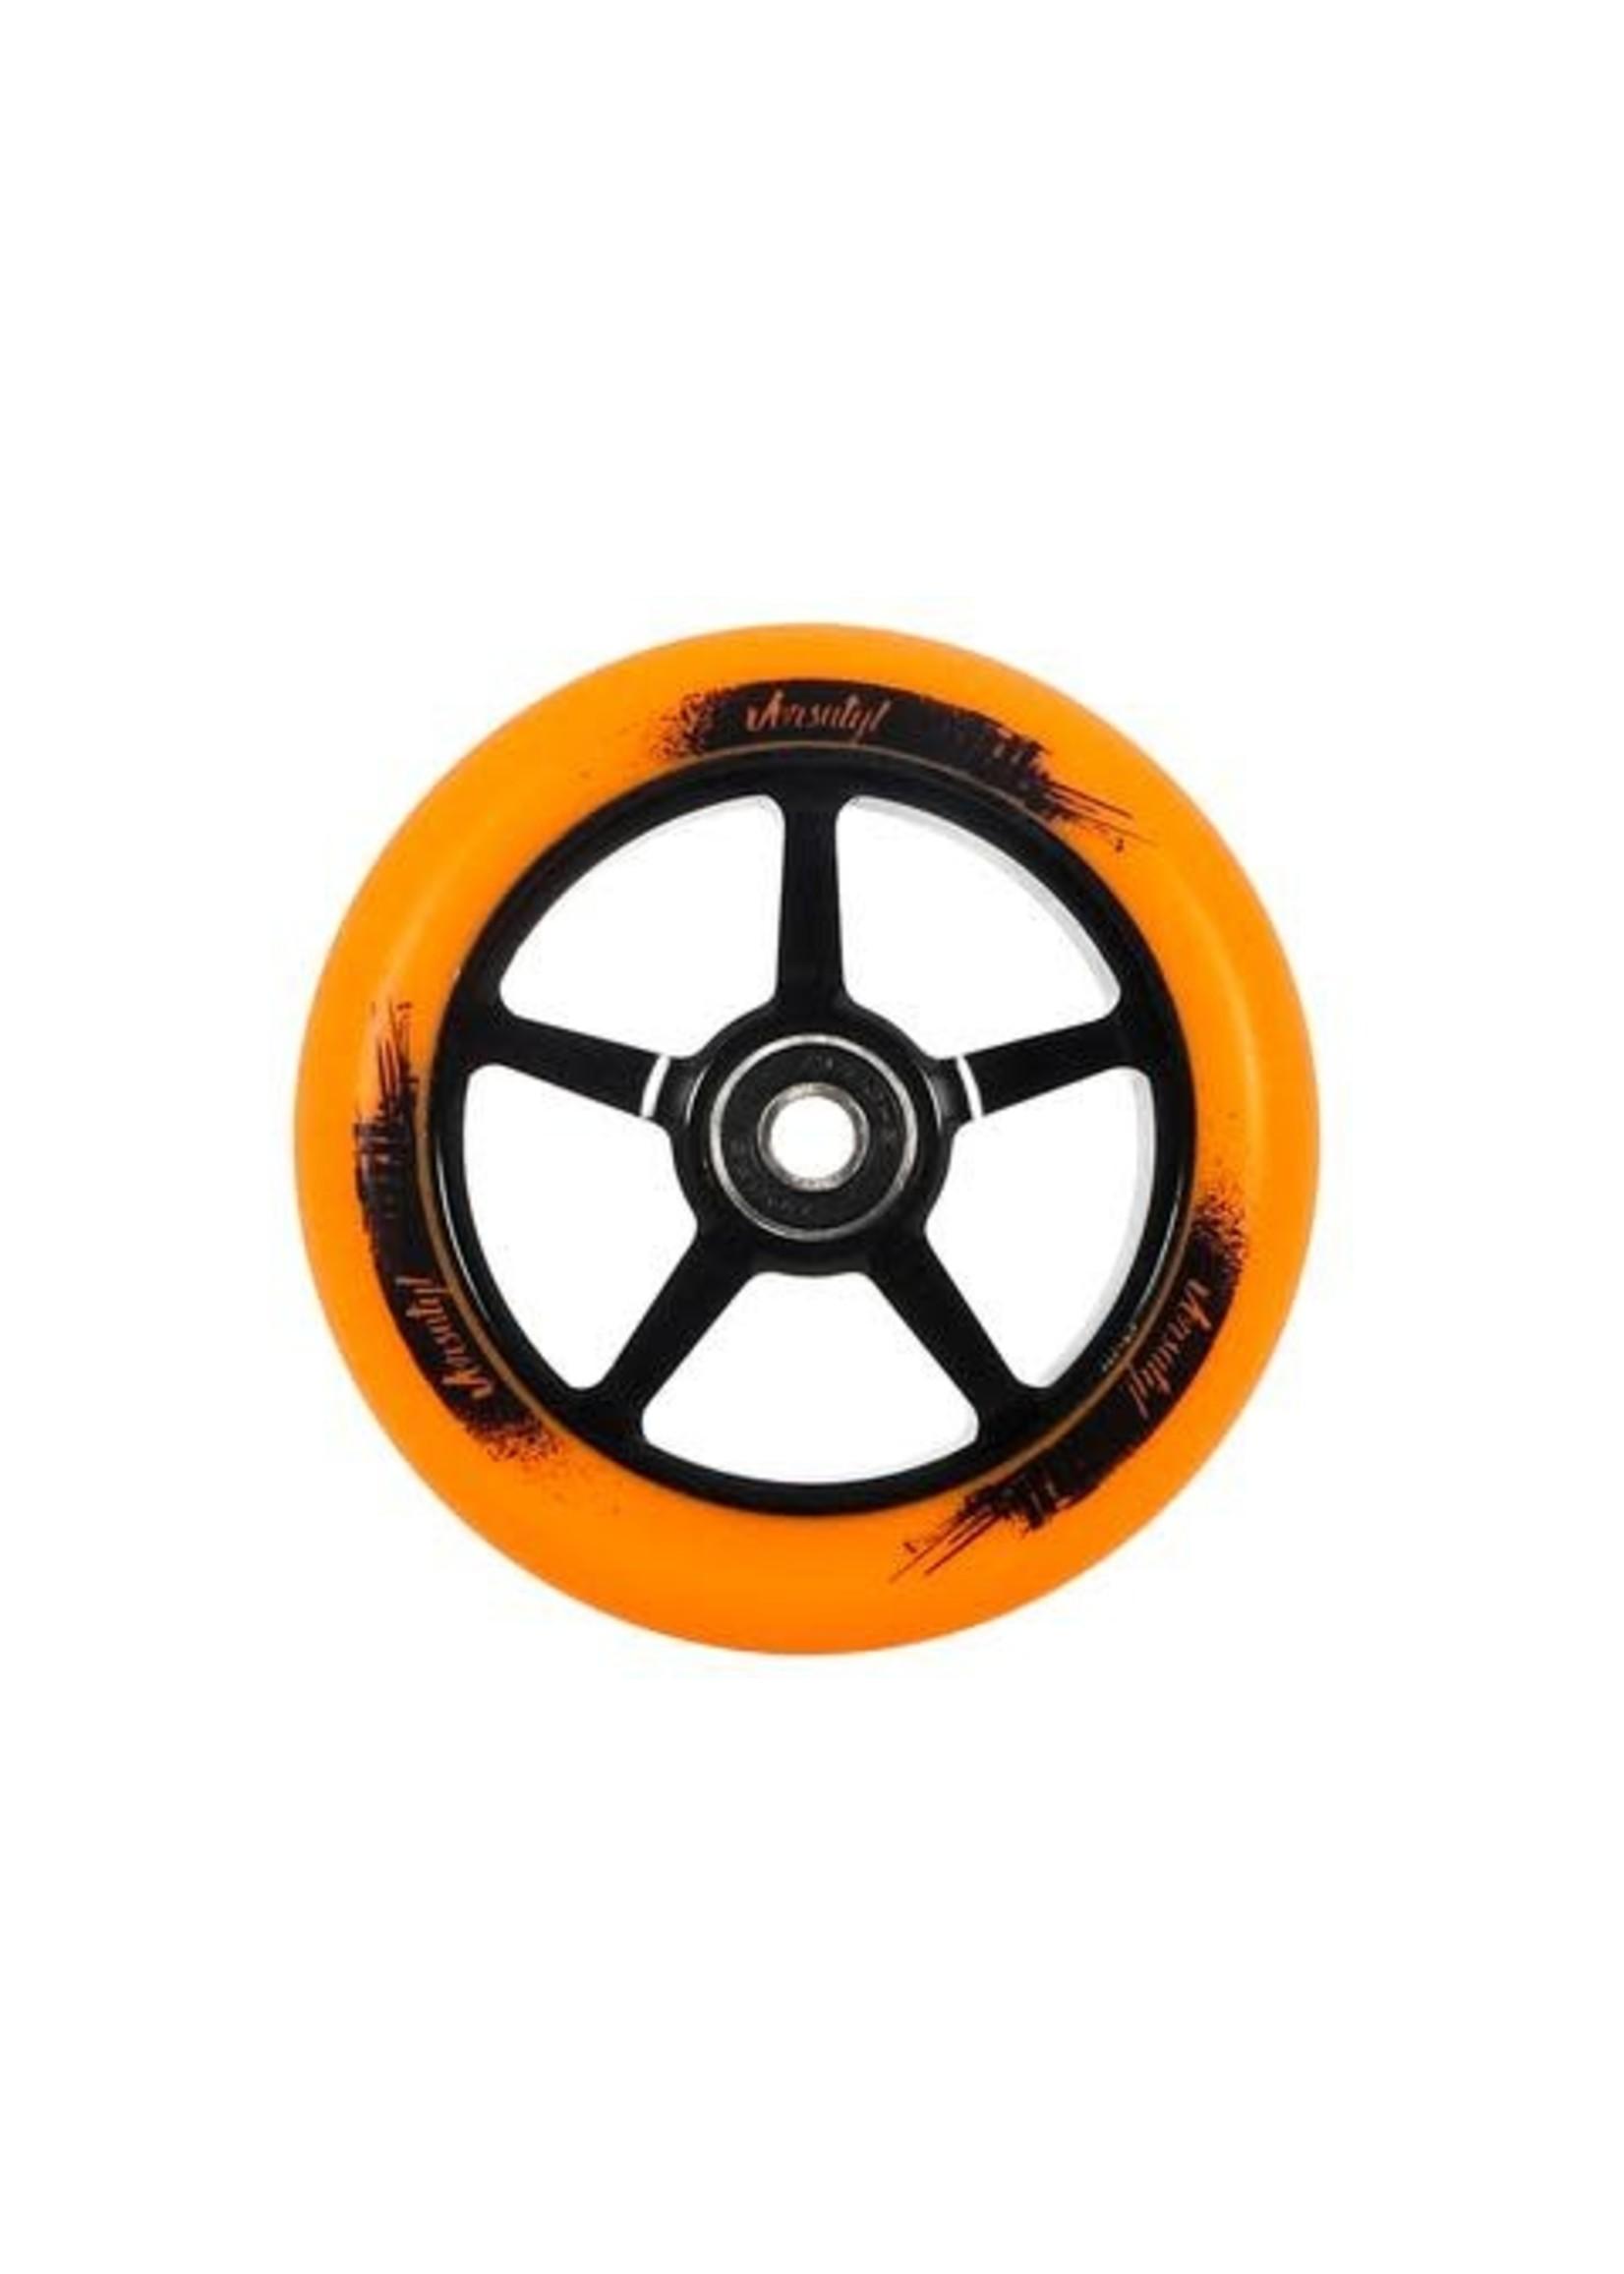 Versatyl Versatyl - Wheels - 110mm